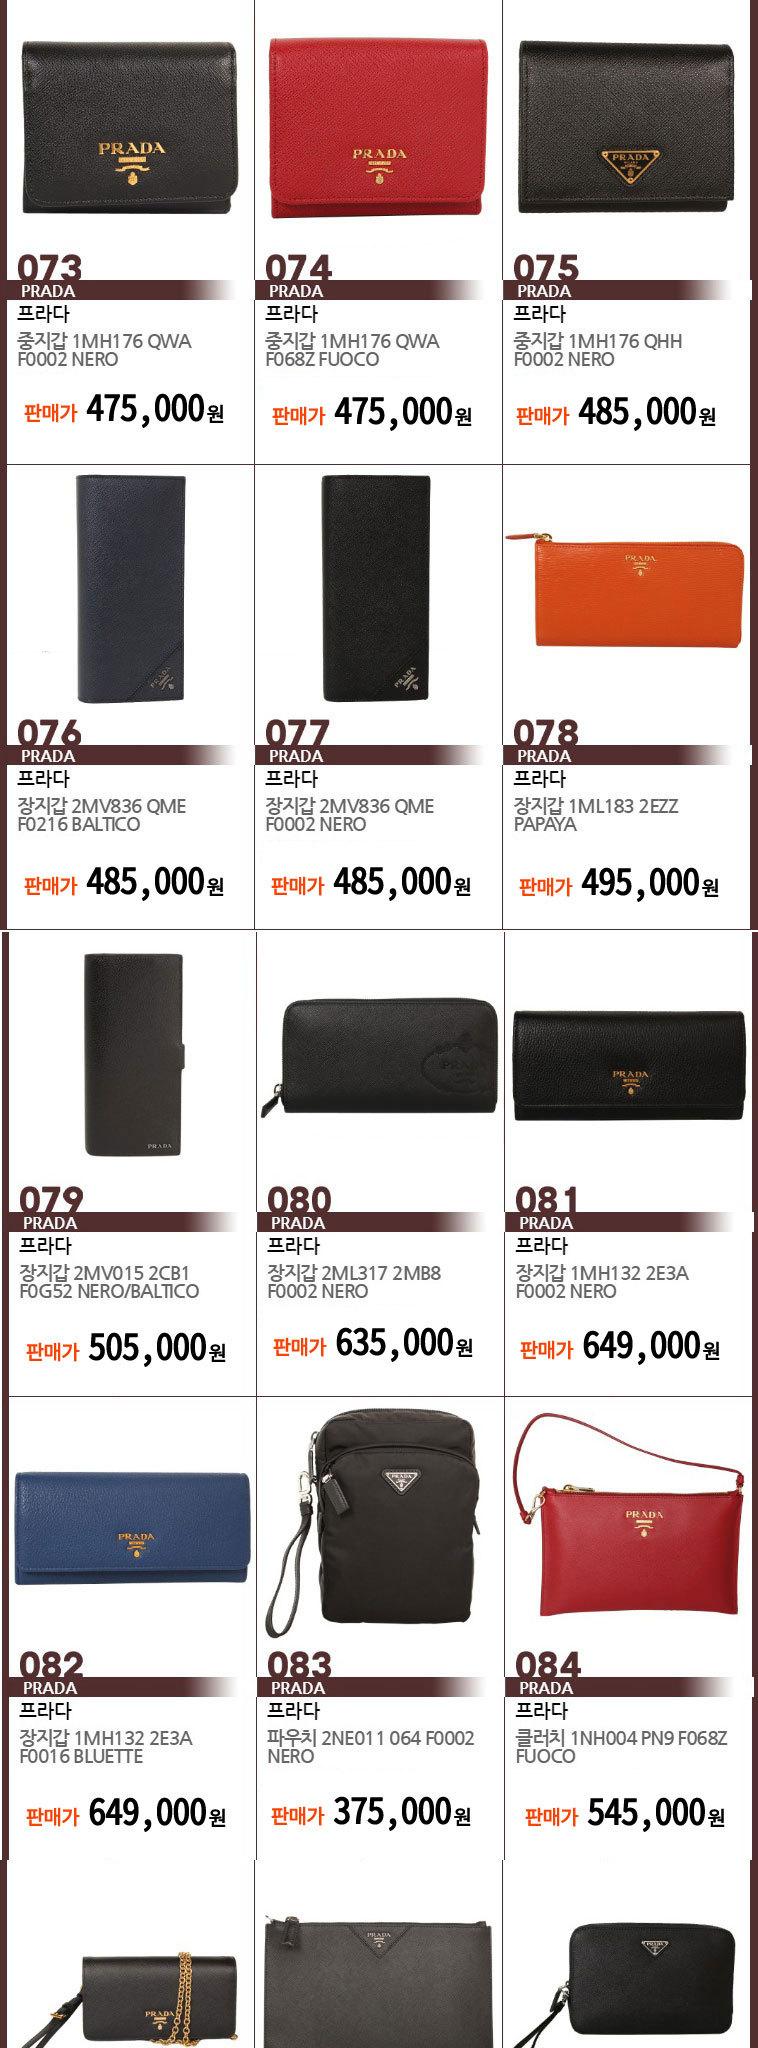 fcab65b43d3 패션뷰티위크] 명품브랜드 인기템! - 특가대표! 위메프